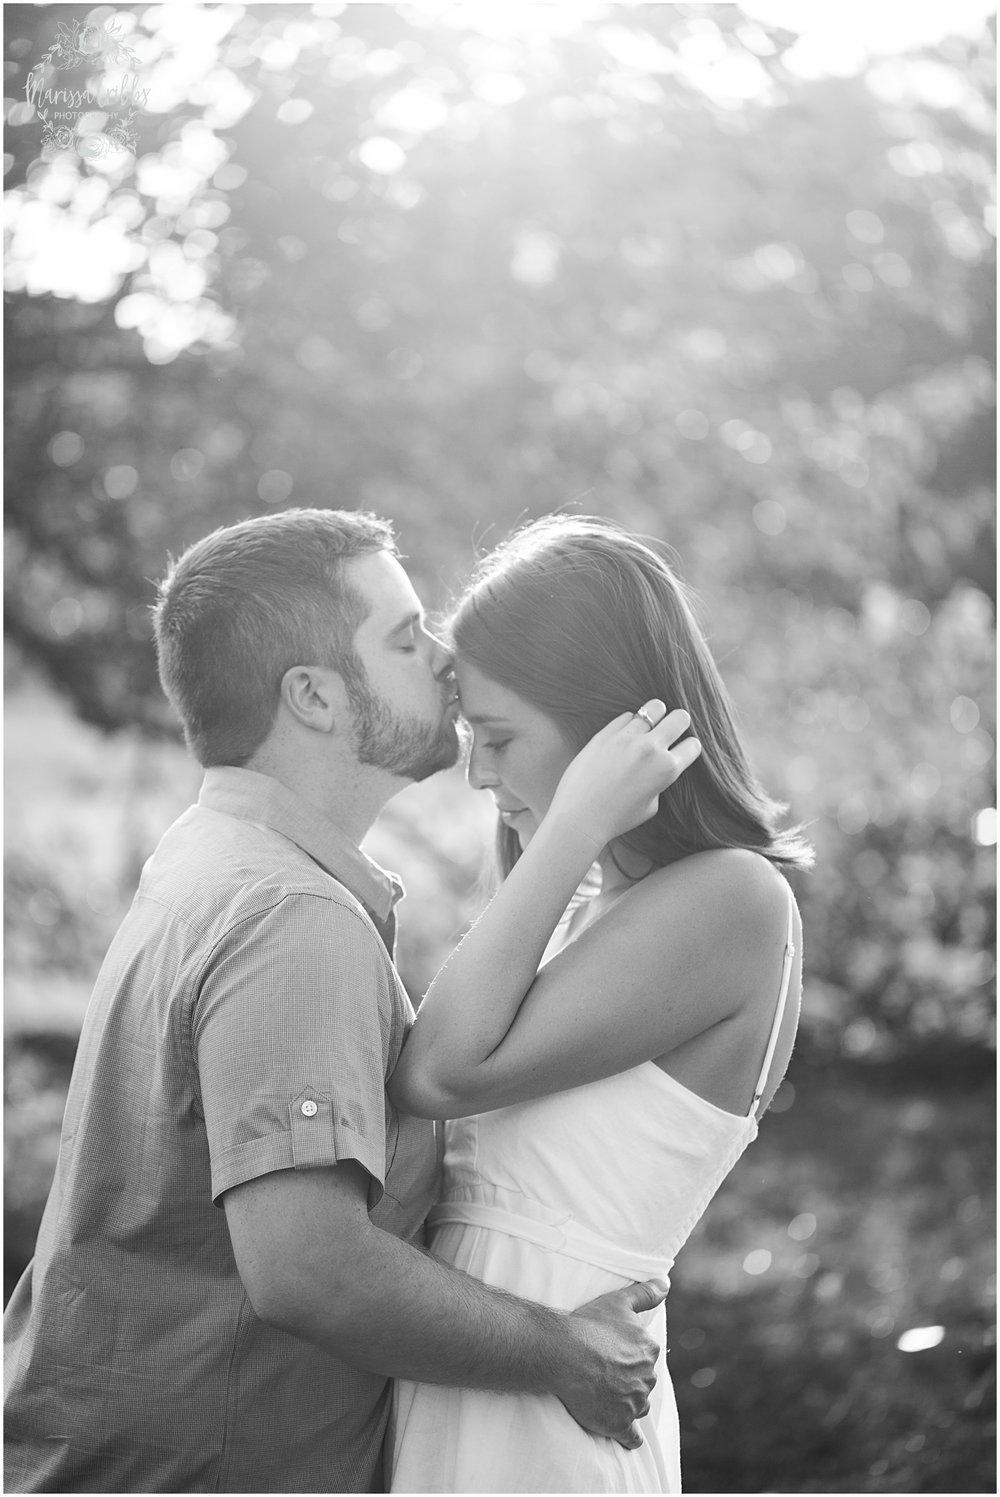 JESSICA & MARK ENGAGED - MARISSA CRIBBS PHOTOGRAPHY_5569.jpg